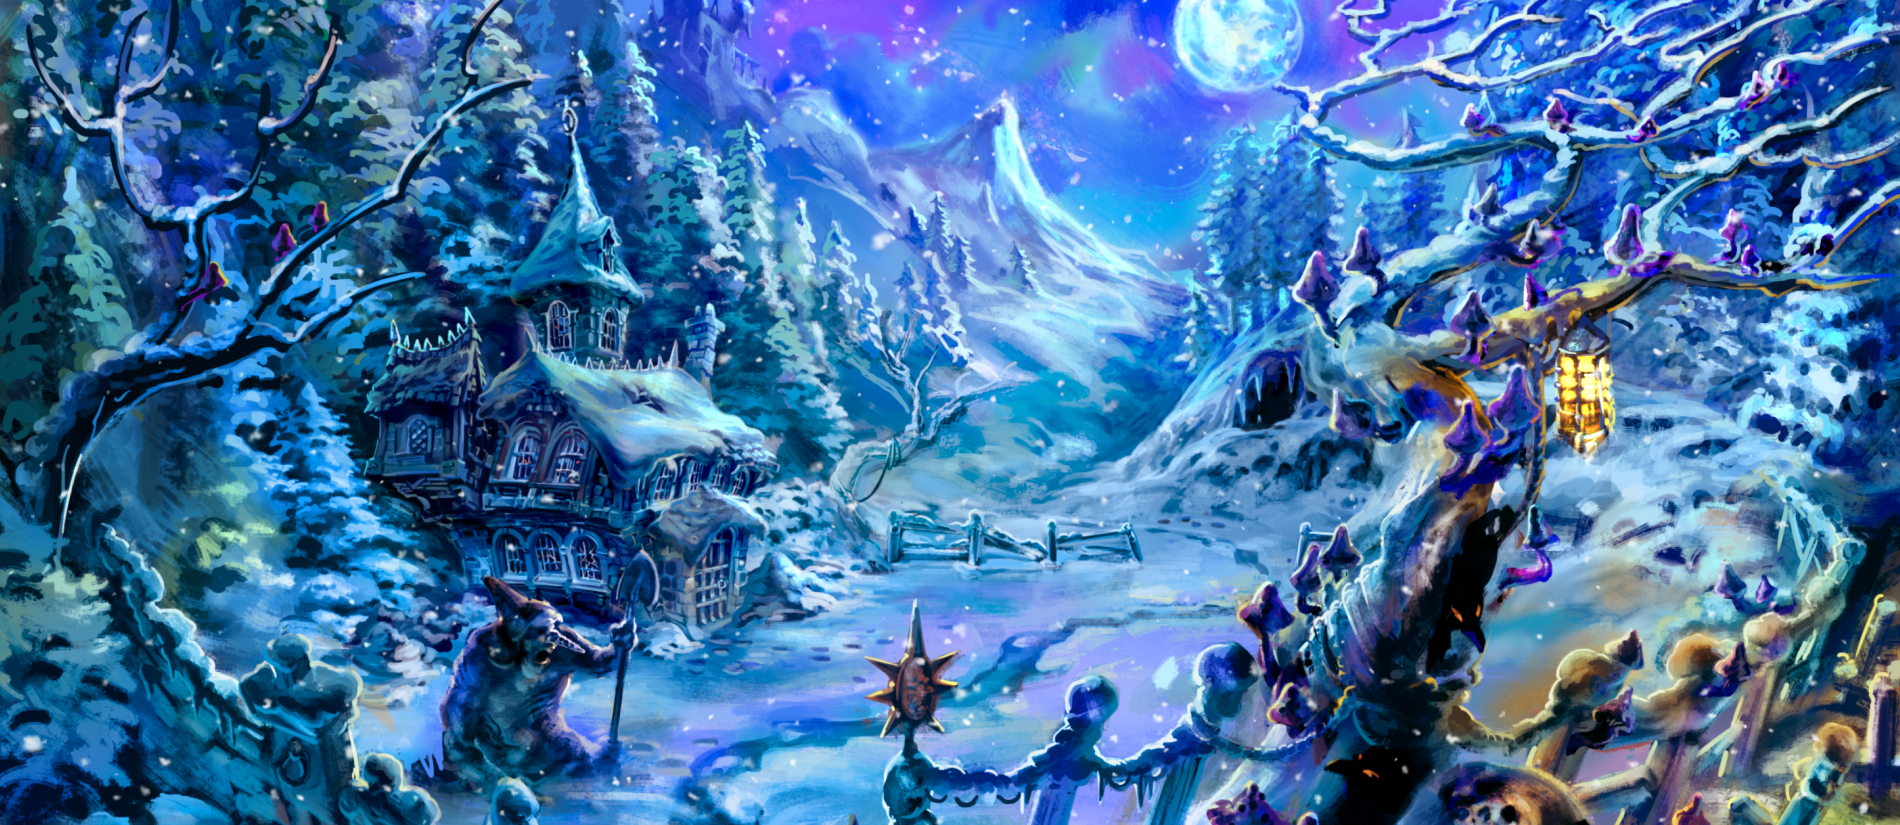 vsefvGloomspike_snowy_banner_DAY-04-.jpg